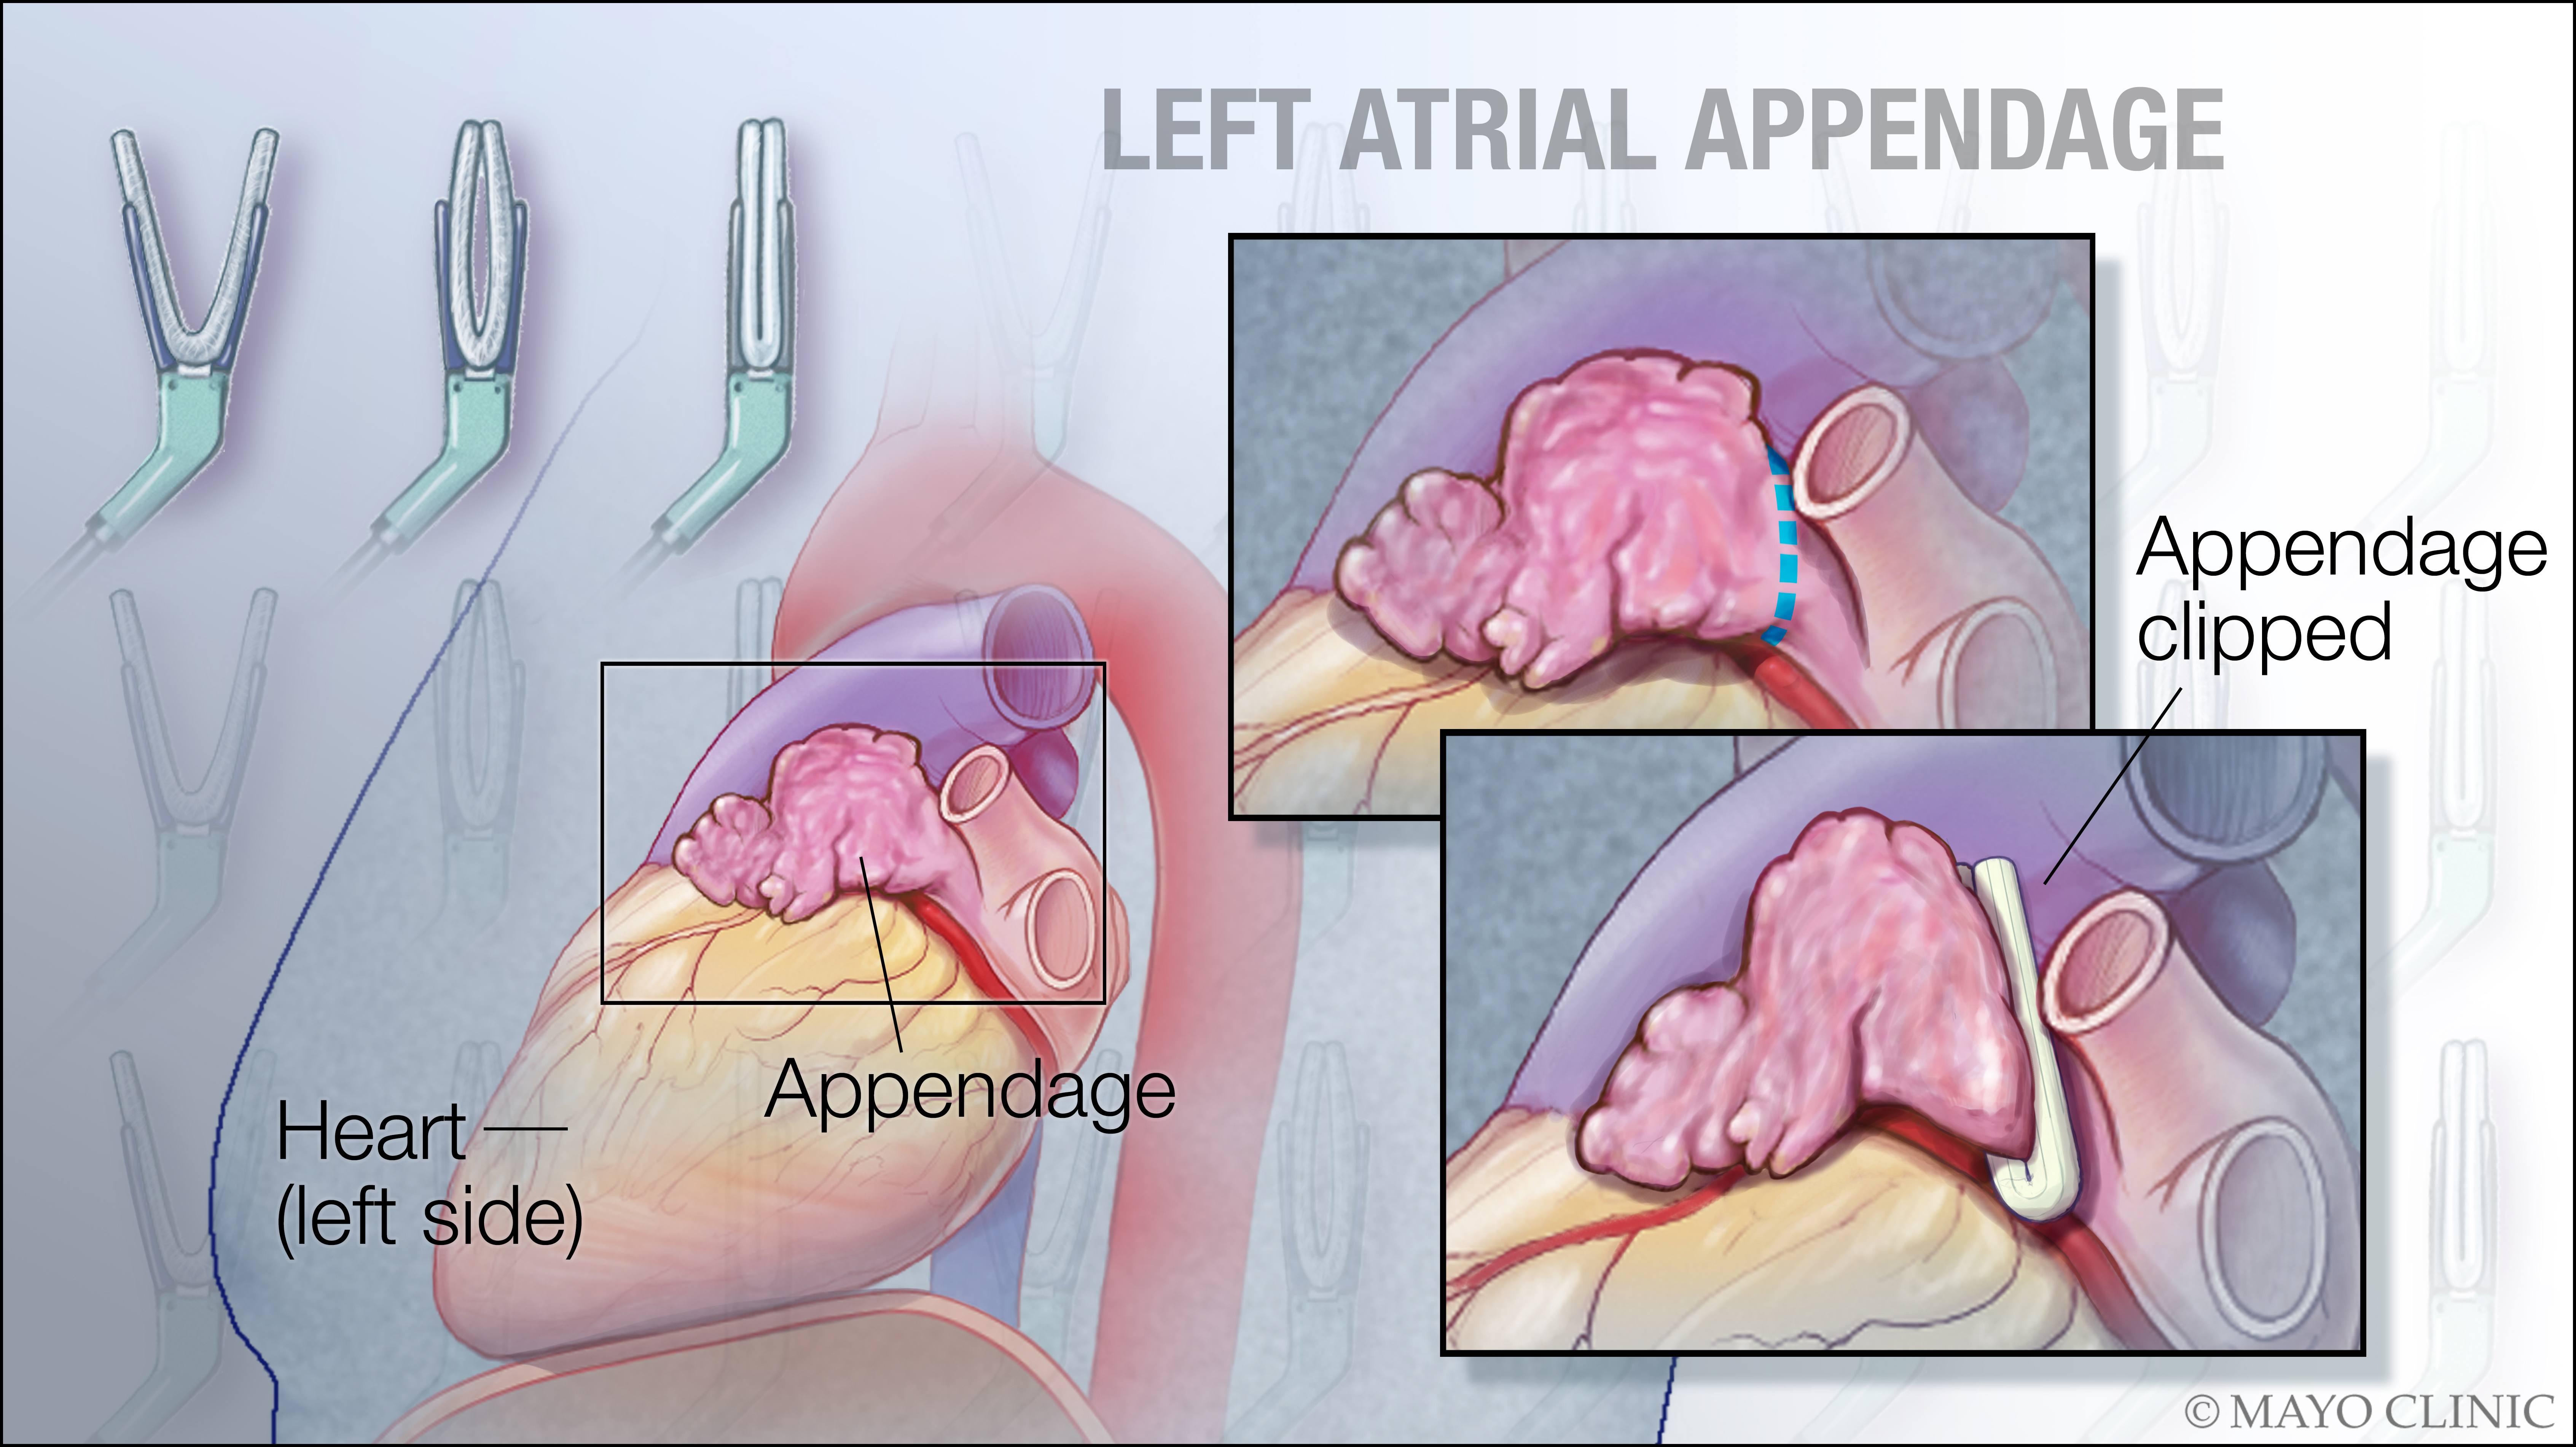 illustration of left atrial appendage